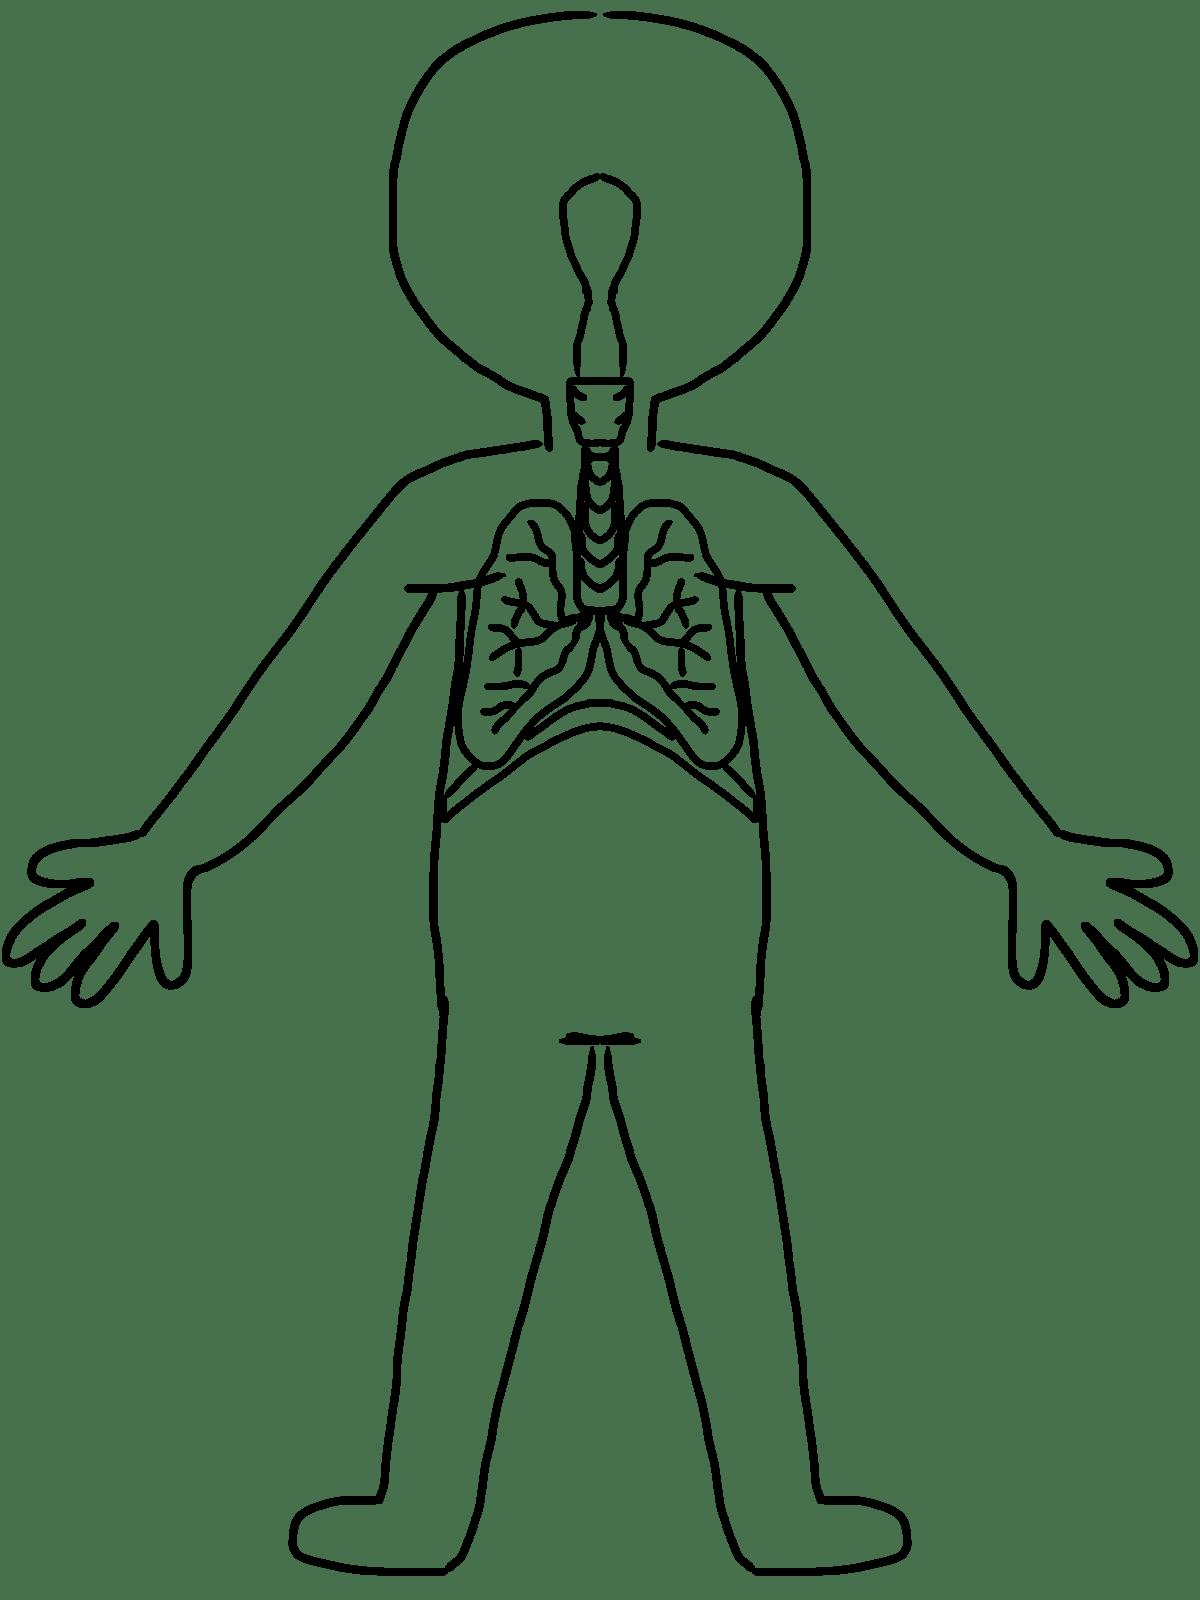 Human Body Line Drawing At Getdrawings